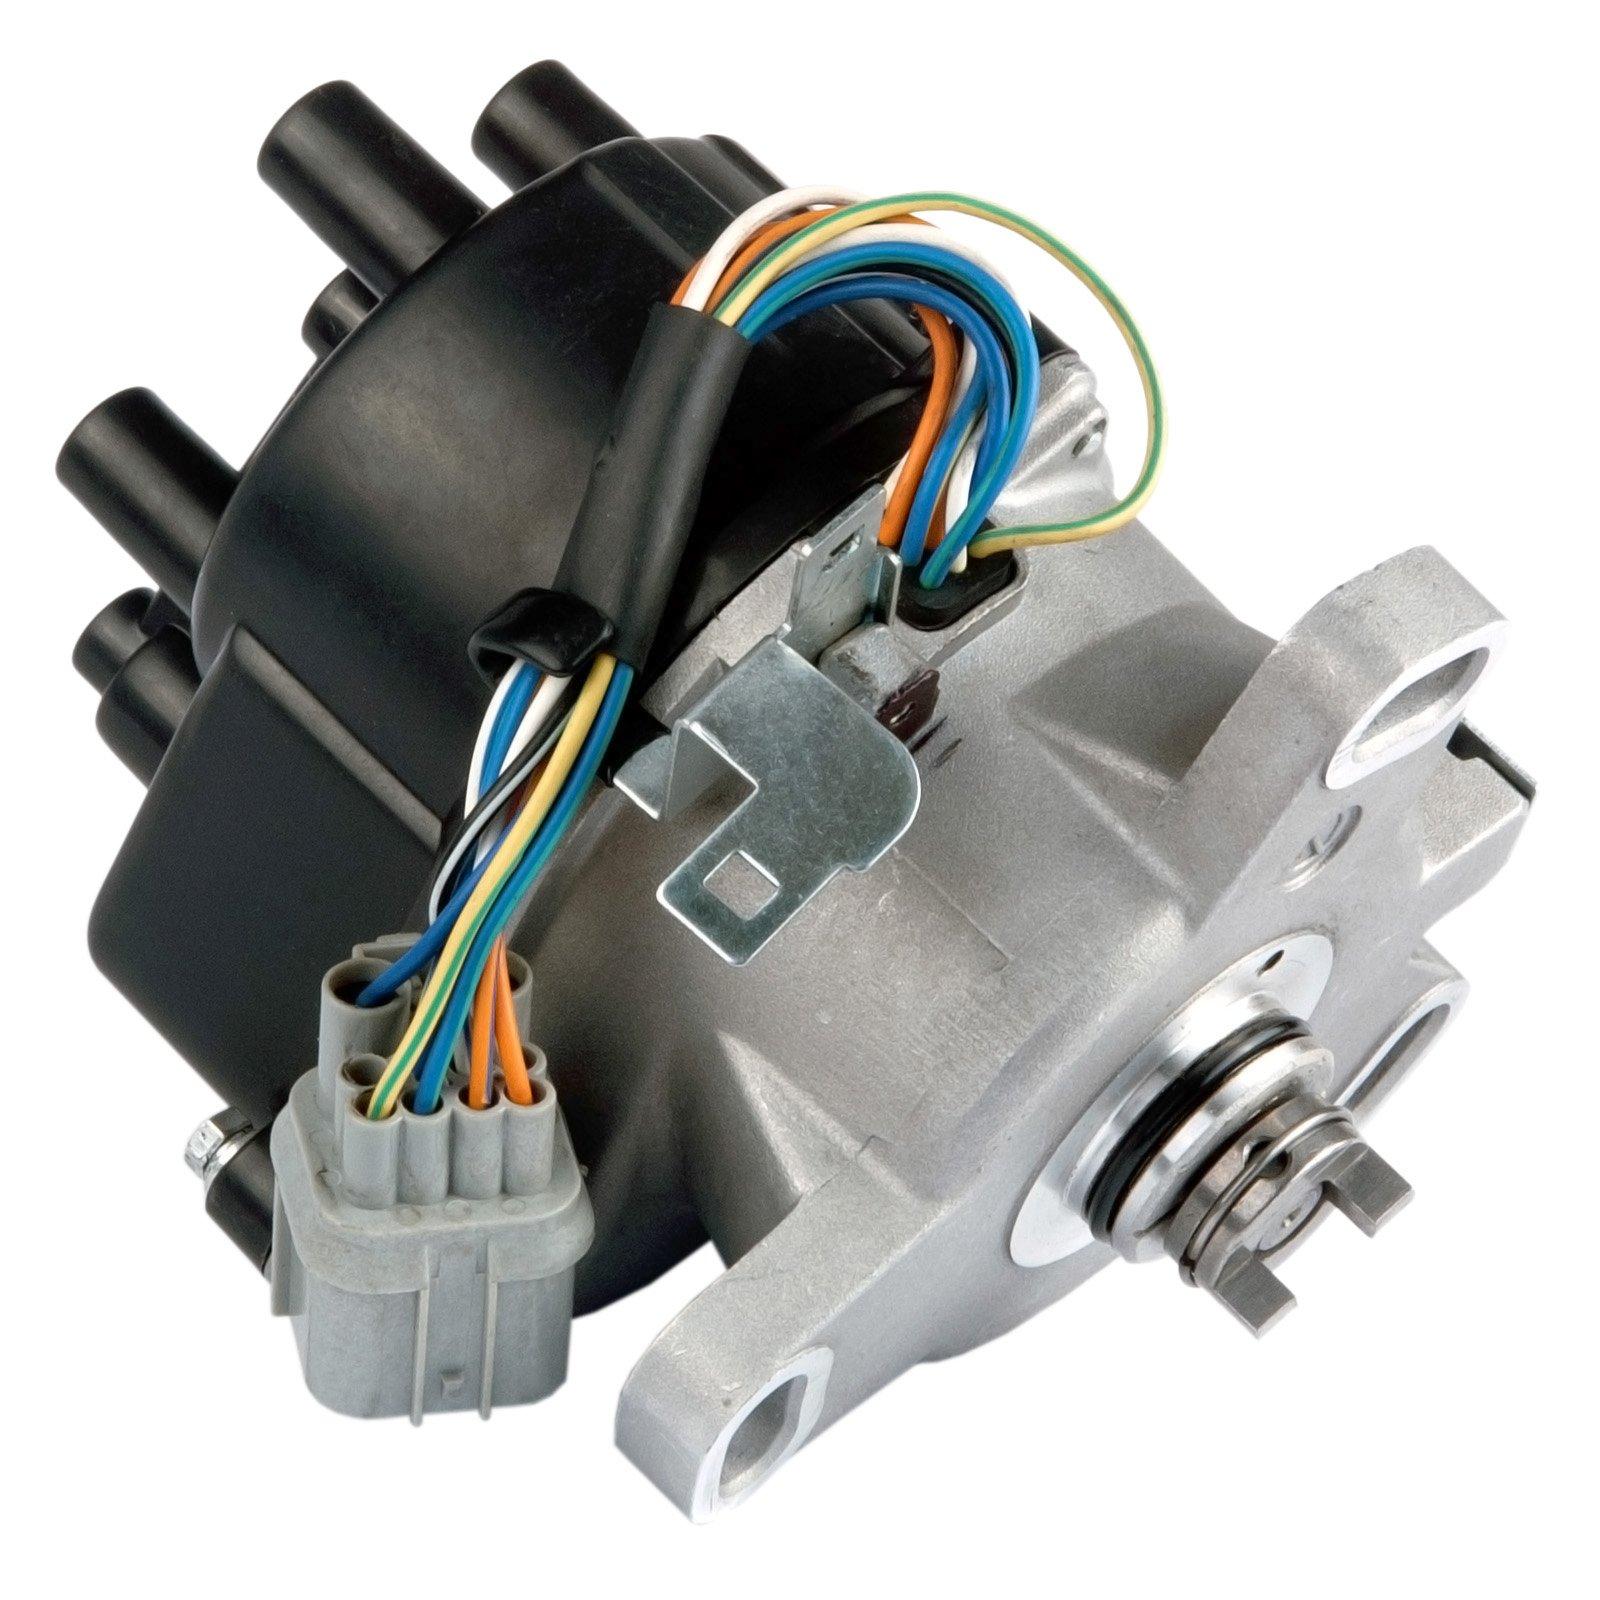 King Auto Parts Brand New Compatible Ignition Distributor w/Cap & Rotor TD-80U TD80U TD-98U for 96-98 Honda Civic 1.6L SOHC Civic del Sol TEC D16Y7 D16Y 30100-P2E-A01 30100P2EA01